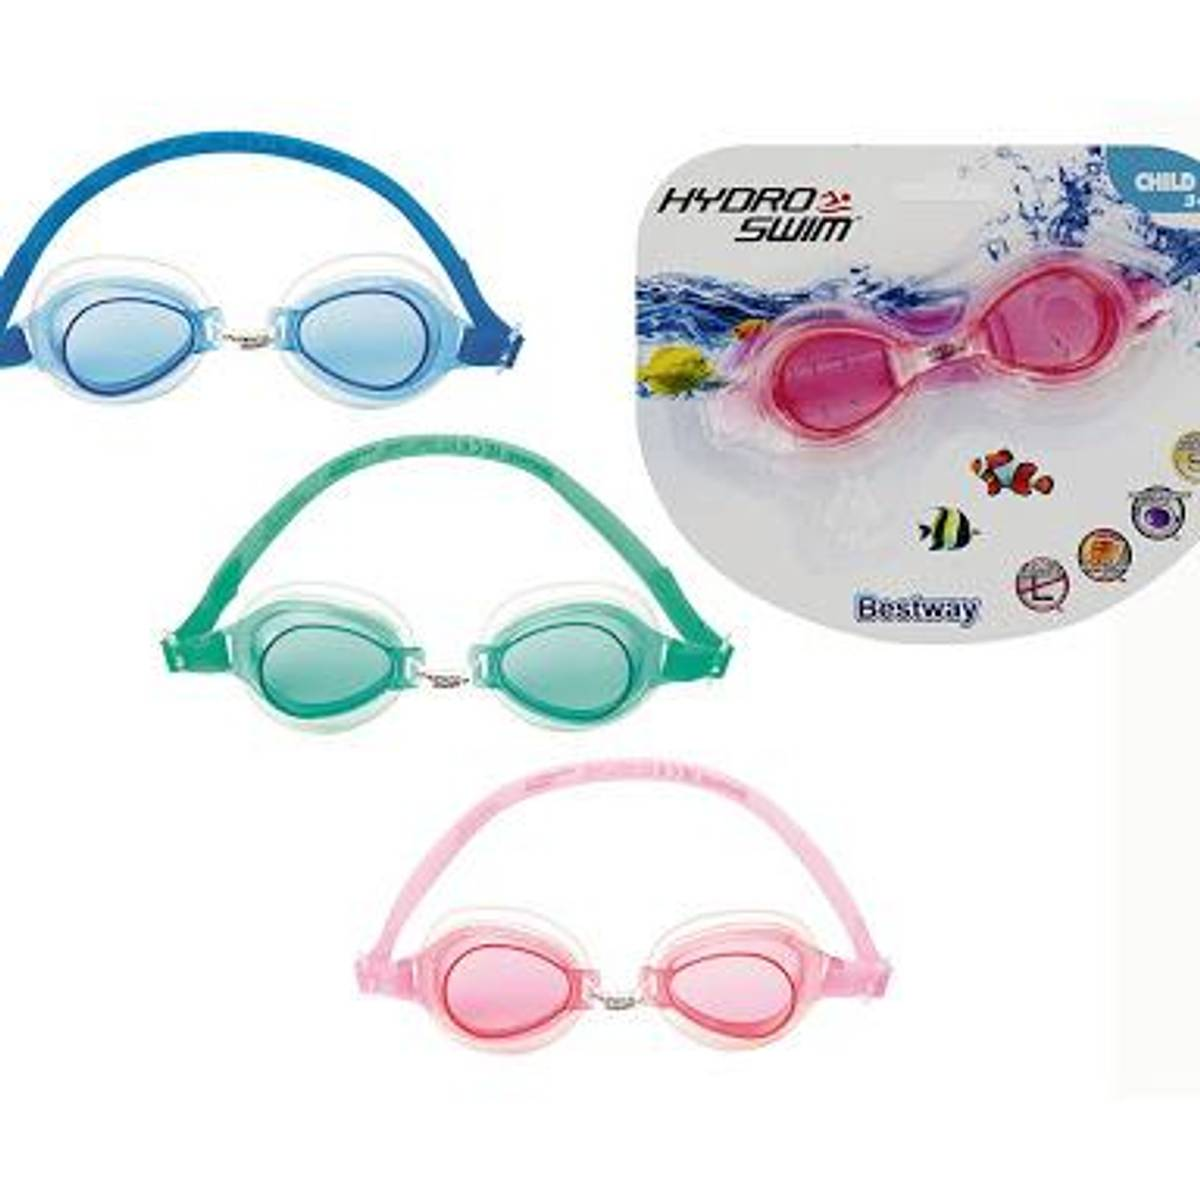 Rosa Hydro swim youth 3 svømmebriller